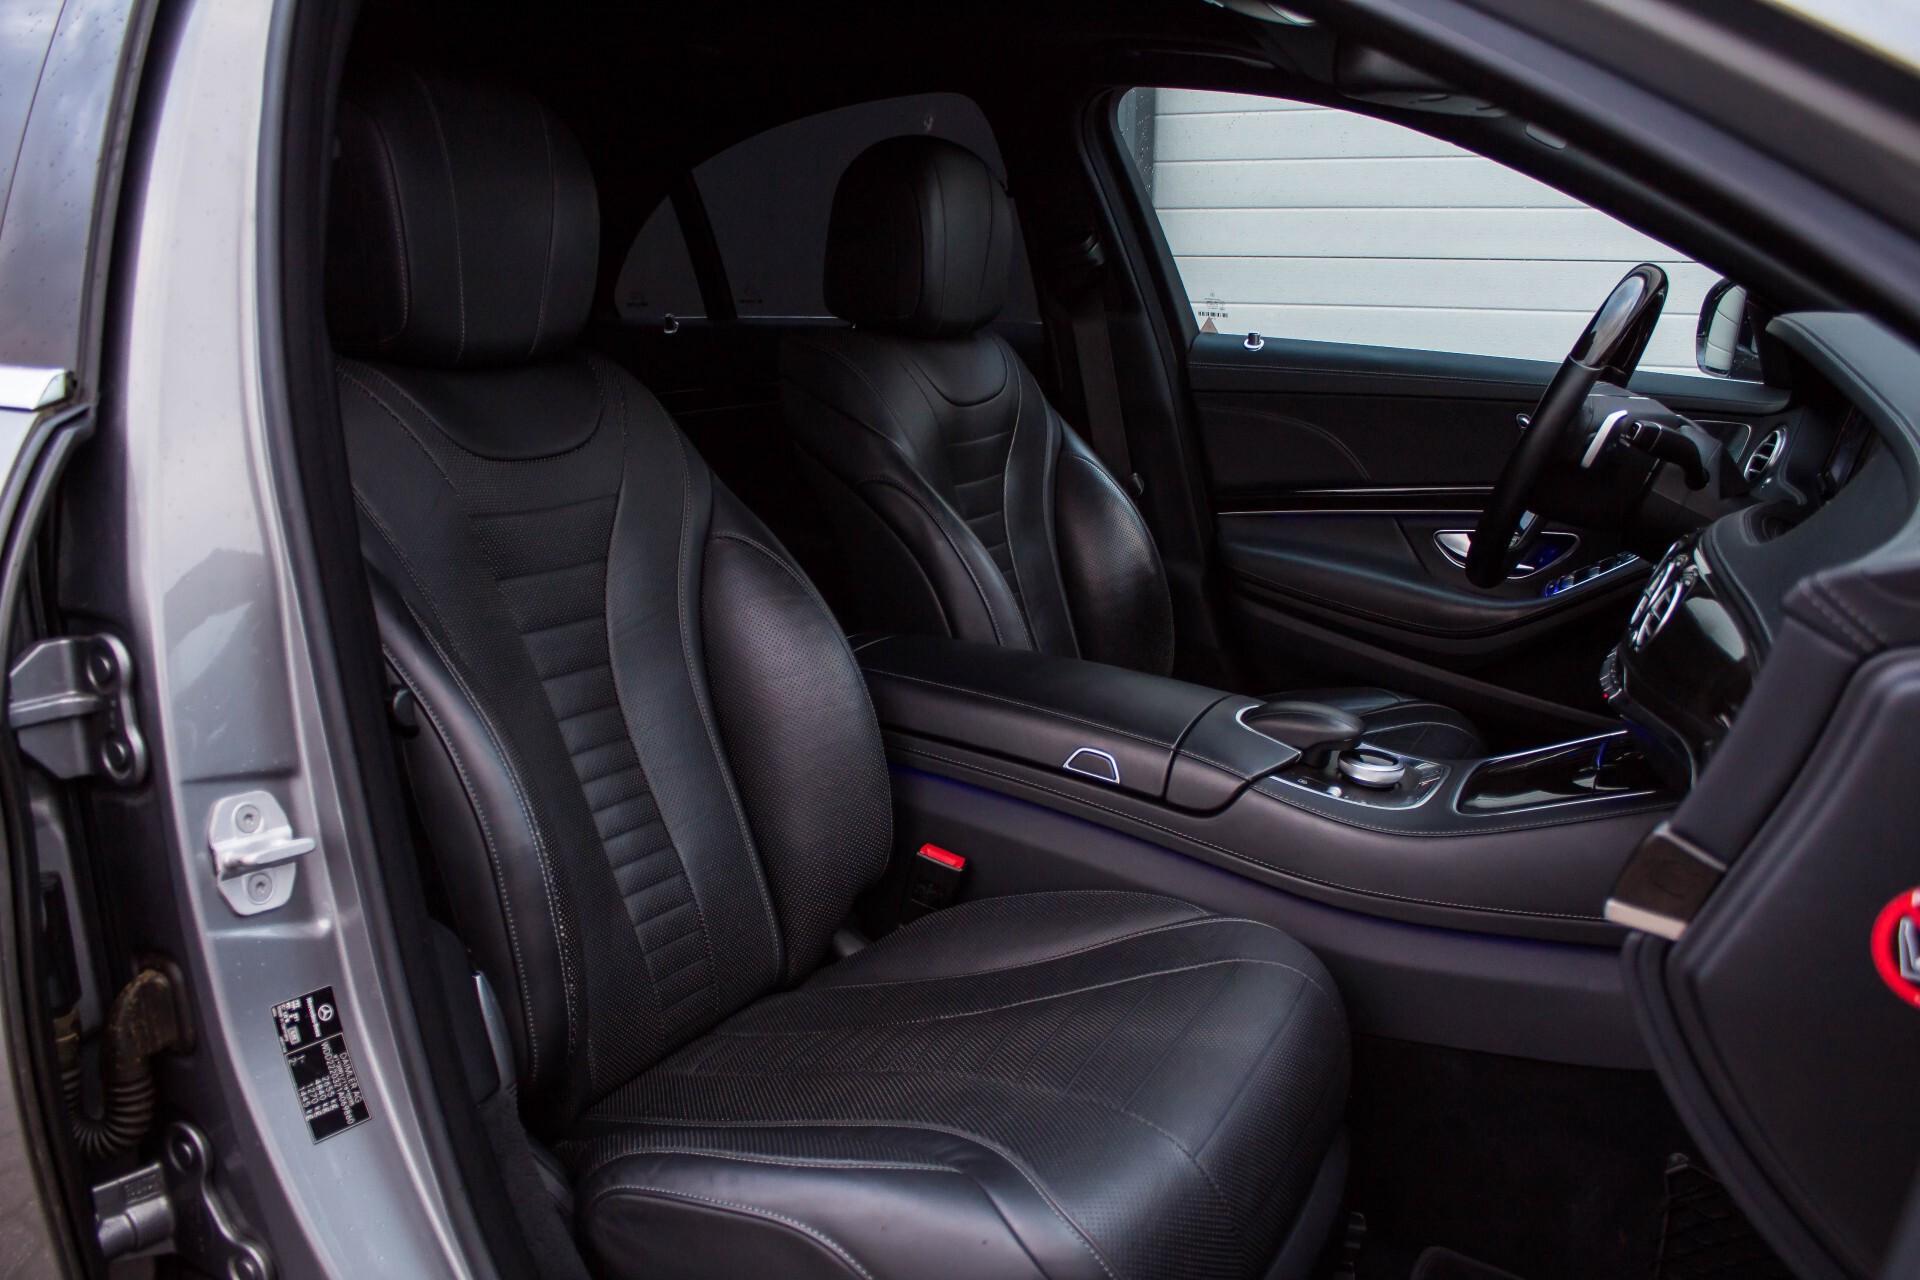 Mercedes-Benz S-Klasse 350 BlueTEC 63 AMG Panorama/Distronic/Keyless/Massage/Burmester Aut7 Foto 3